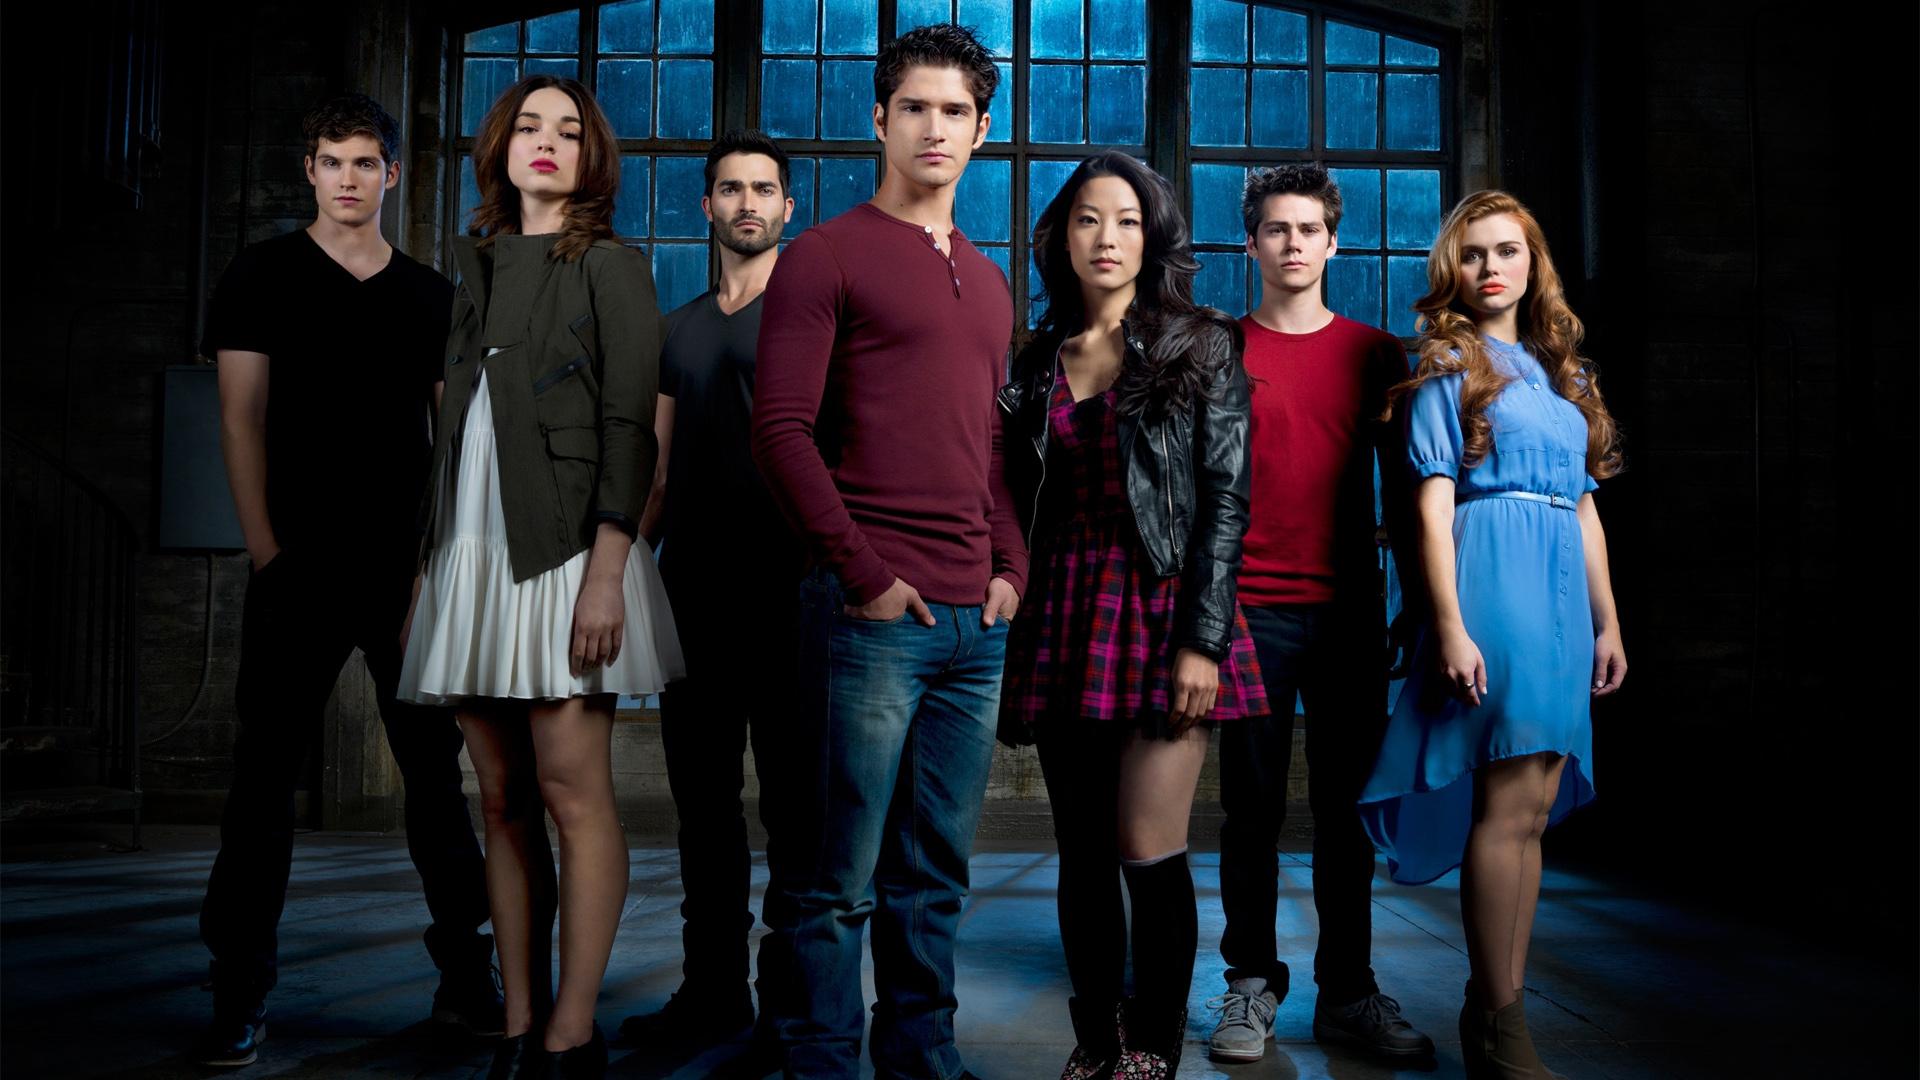 Teen Wolf renewed for sixth season